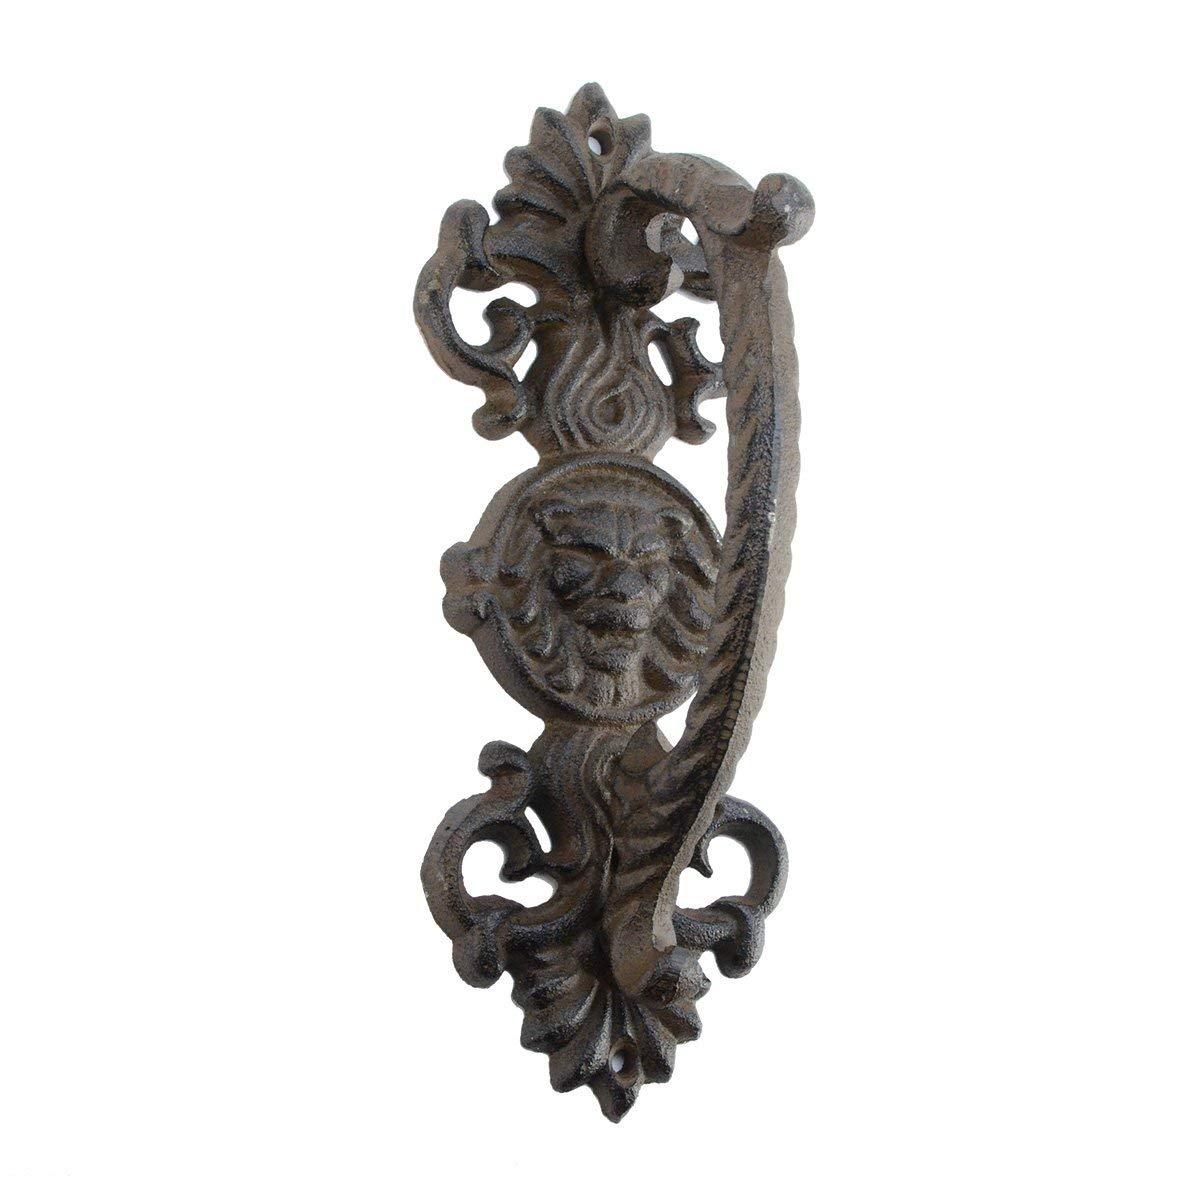 Ornate Cast Iron Lion Head Door Handle Gate Pull Grip